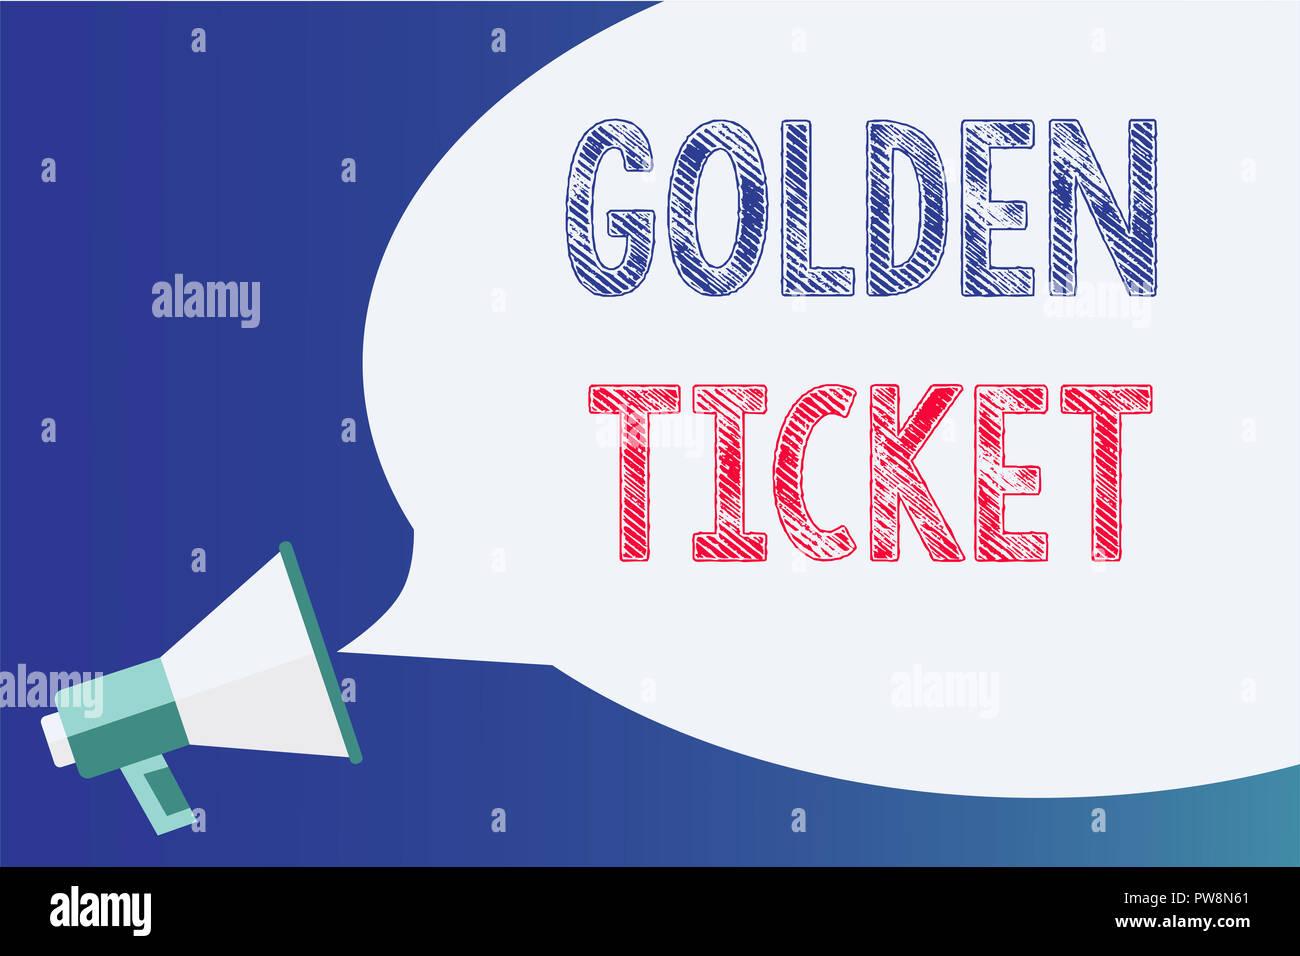 Text sign showing Golden Ticket. Conceptual photo Rain Check Access VIP Passport Box Office Seat Event Megaphone loudspeaker speech bubble important m - Stock Image